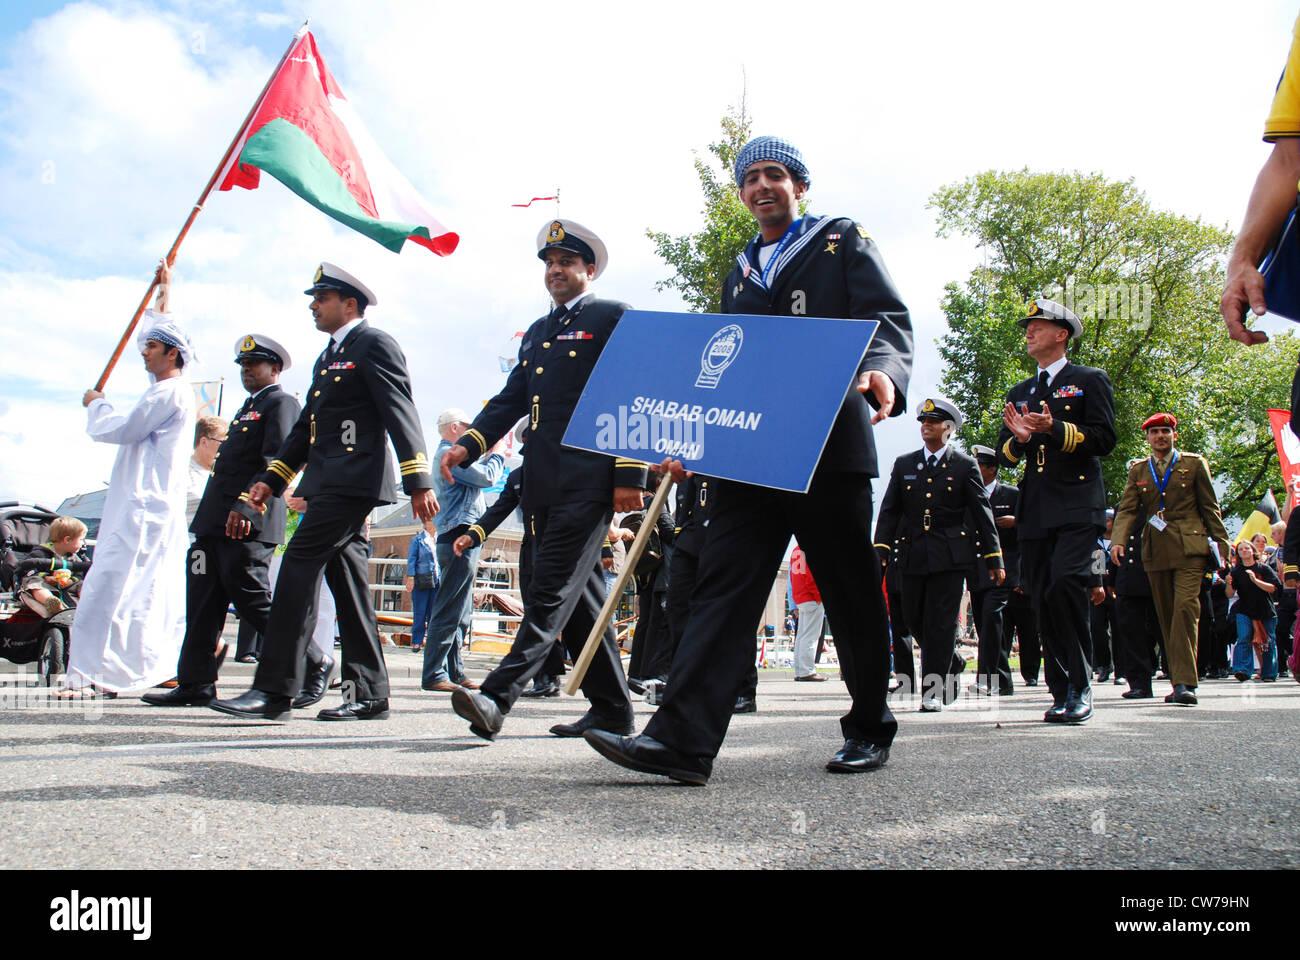 crew of Shabab Oman Tall Ship at parade, Netherlands, Den Helder - Stock Image